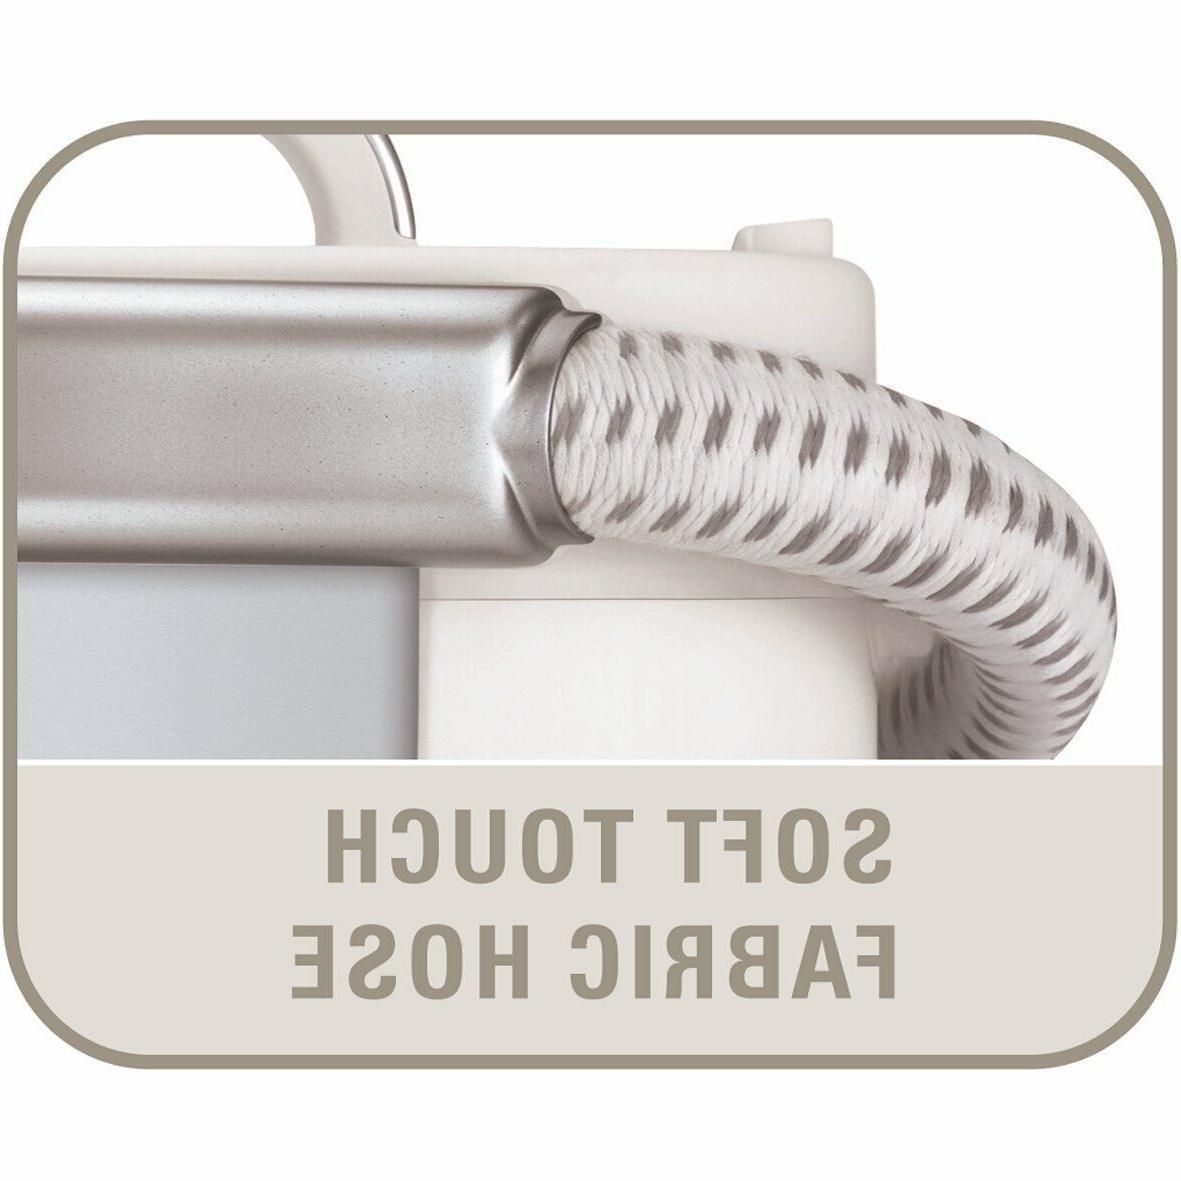 Rowenta Pro Compact Garment Accessories 1400-Wat